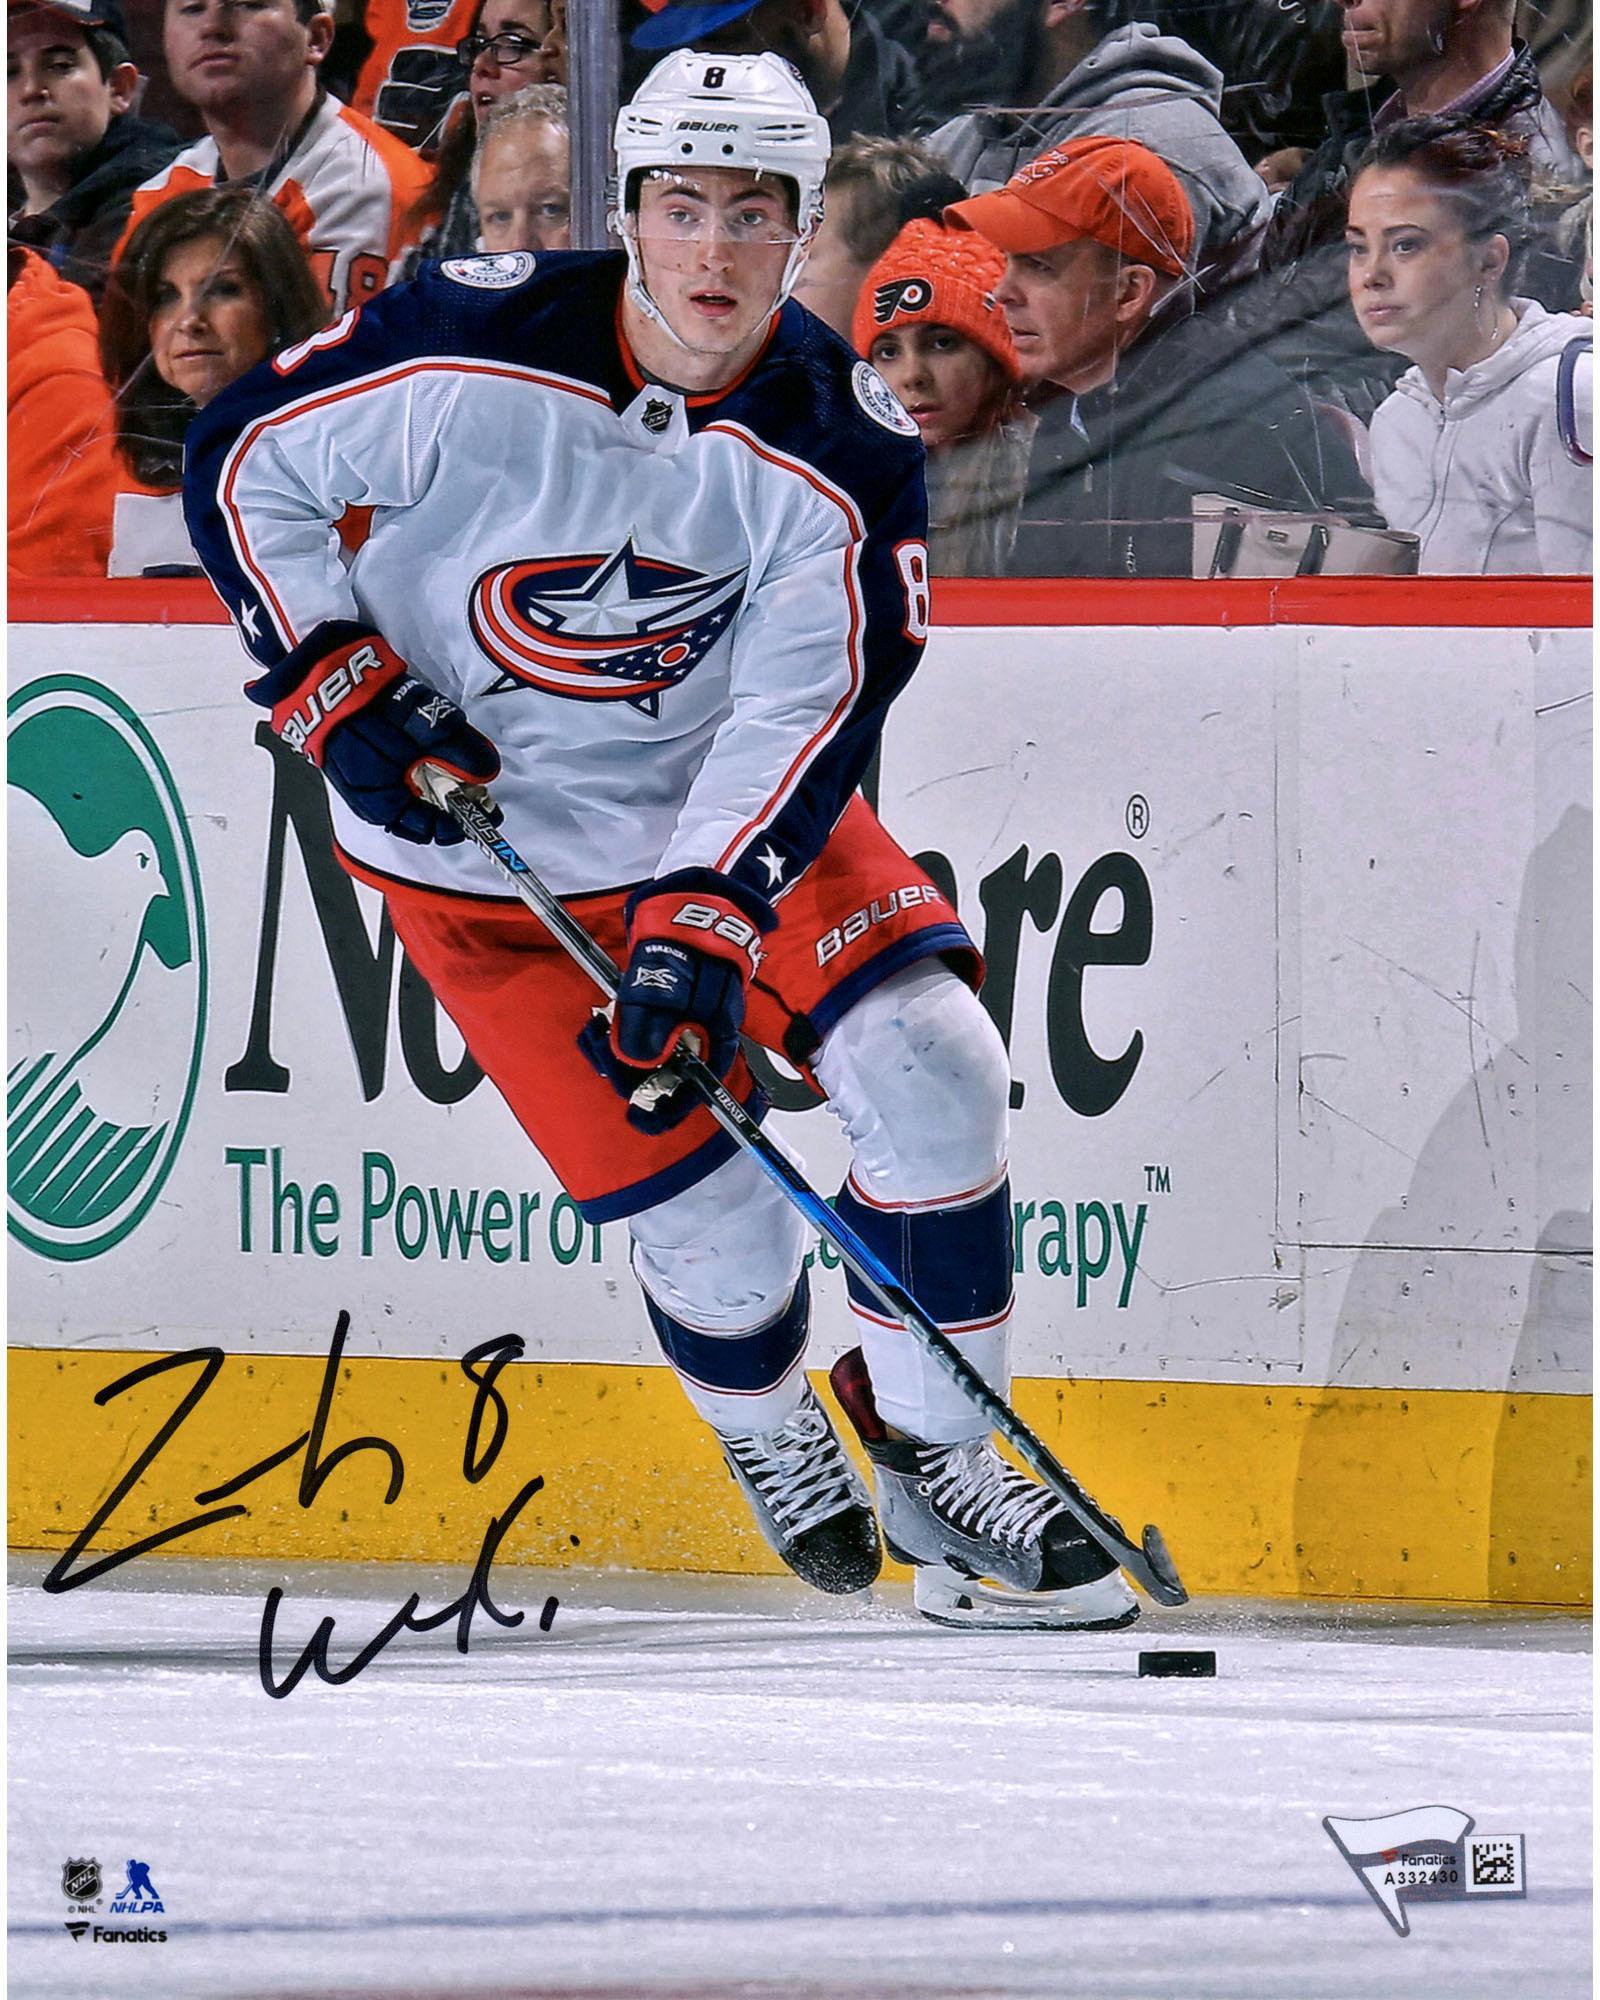 "Zach Werenski Columbus Blue Jackets Autographed 8"" x 10"" White Jersey Skating Photograph Fanatics Authentic... by Fanatics Authentic"